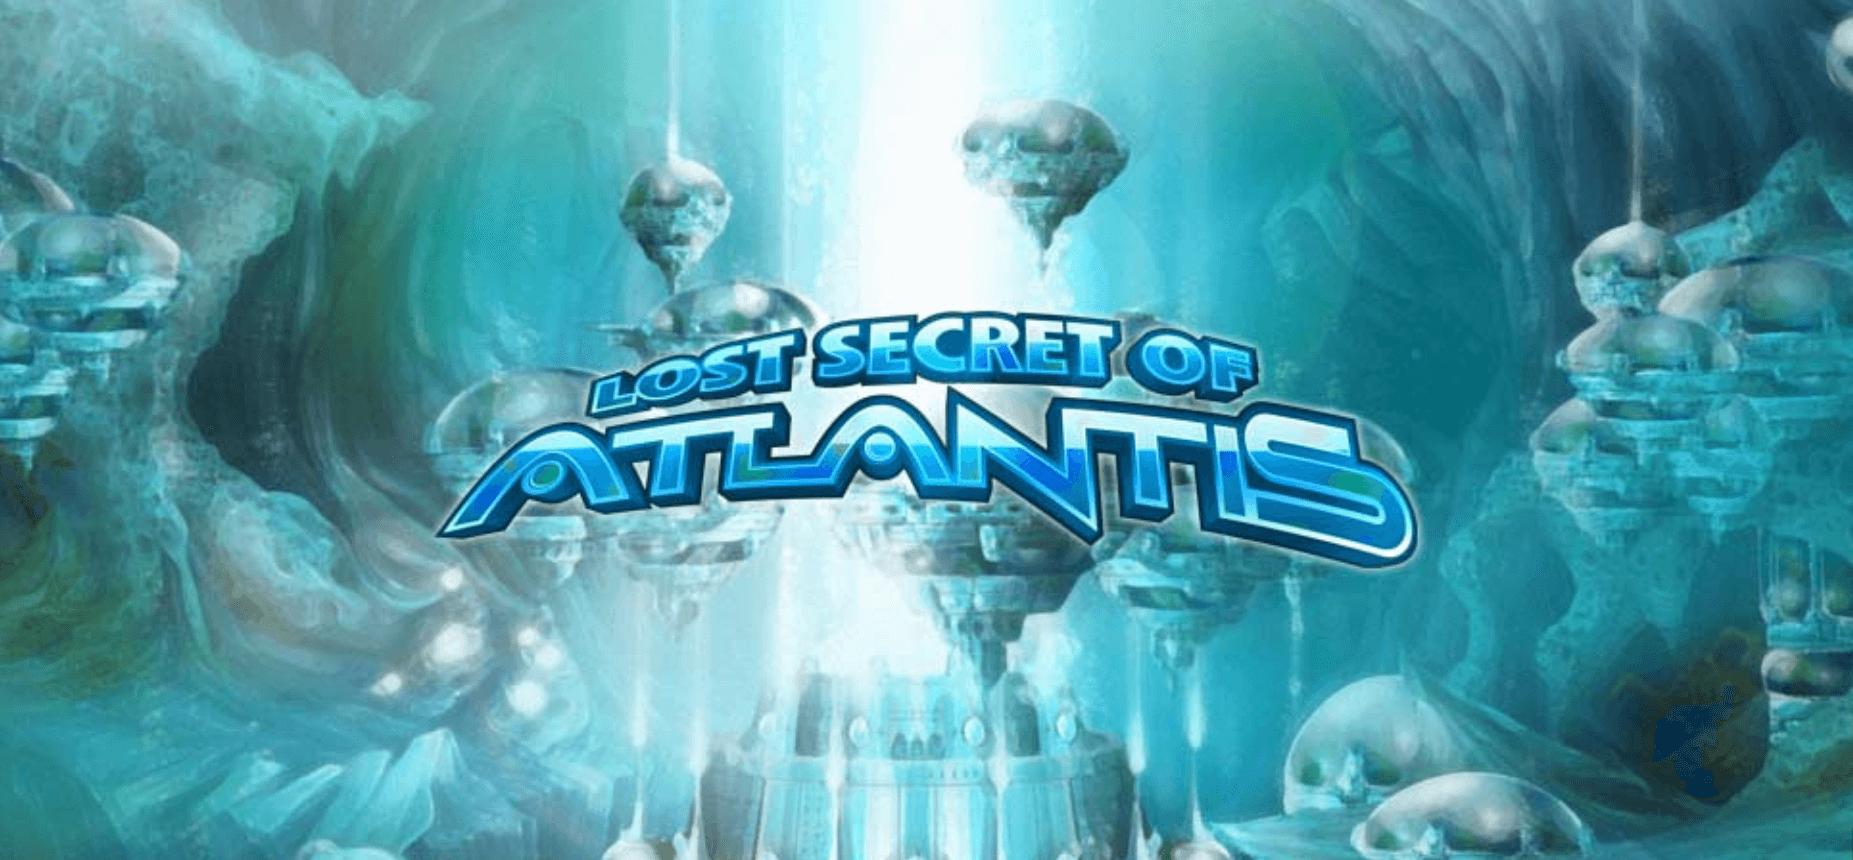 Lost Secret Of Atlantis slot